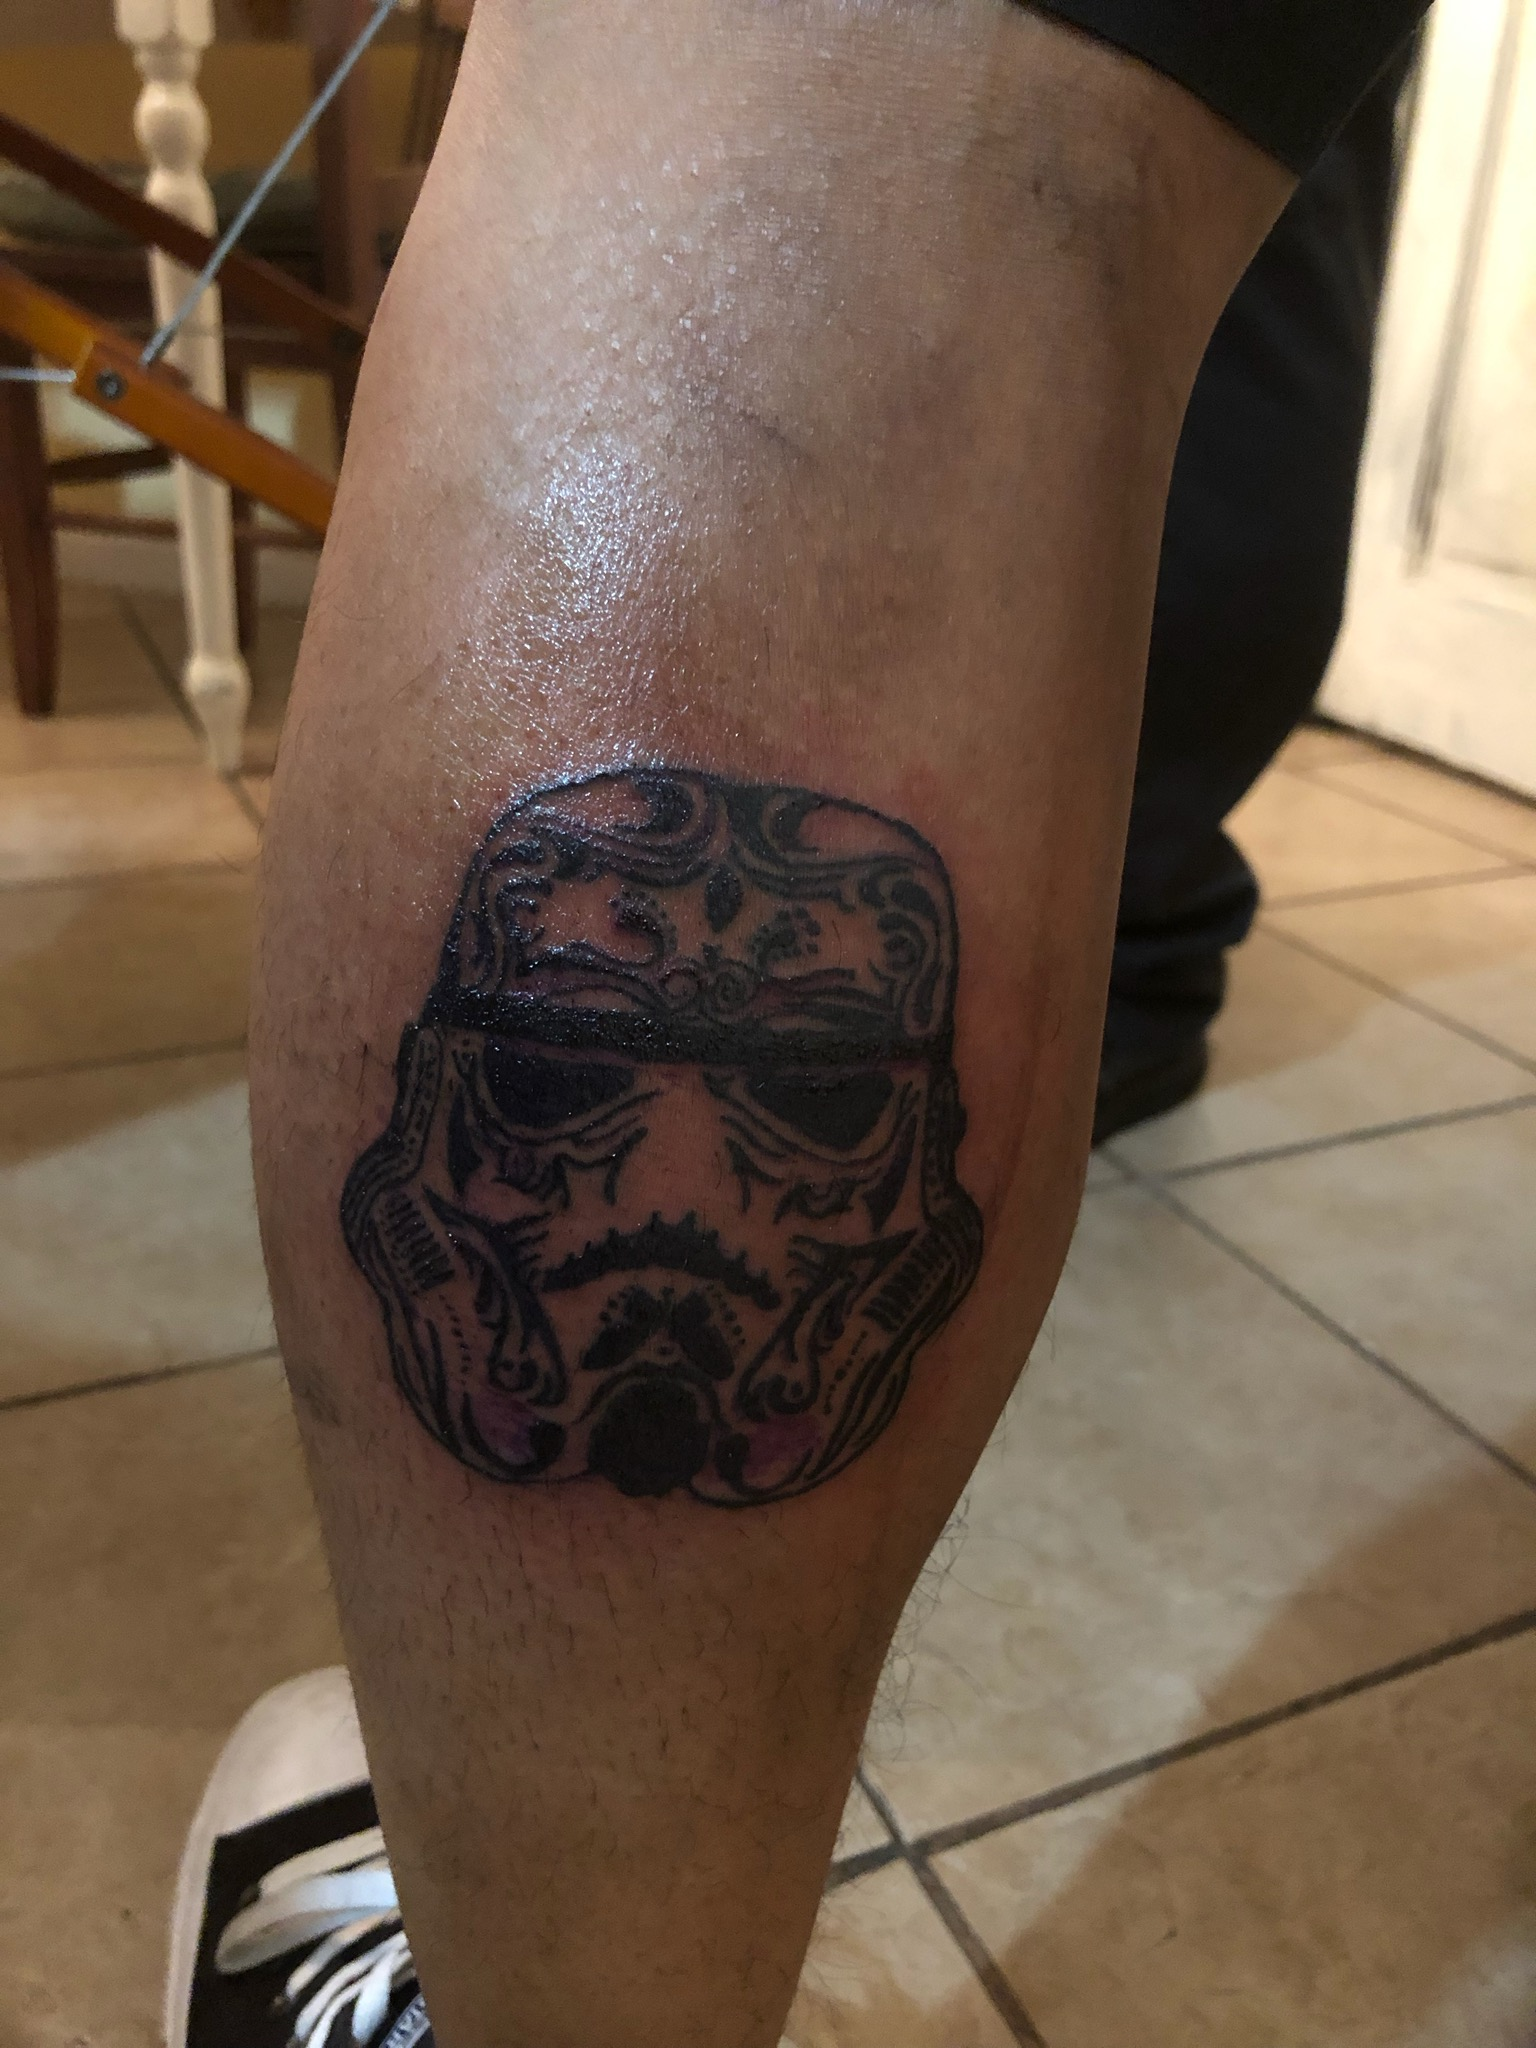 My Dia de los Muertos Storm Trooper